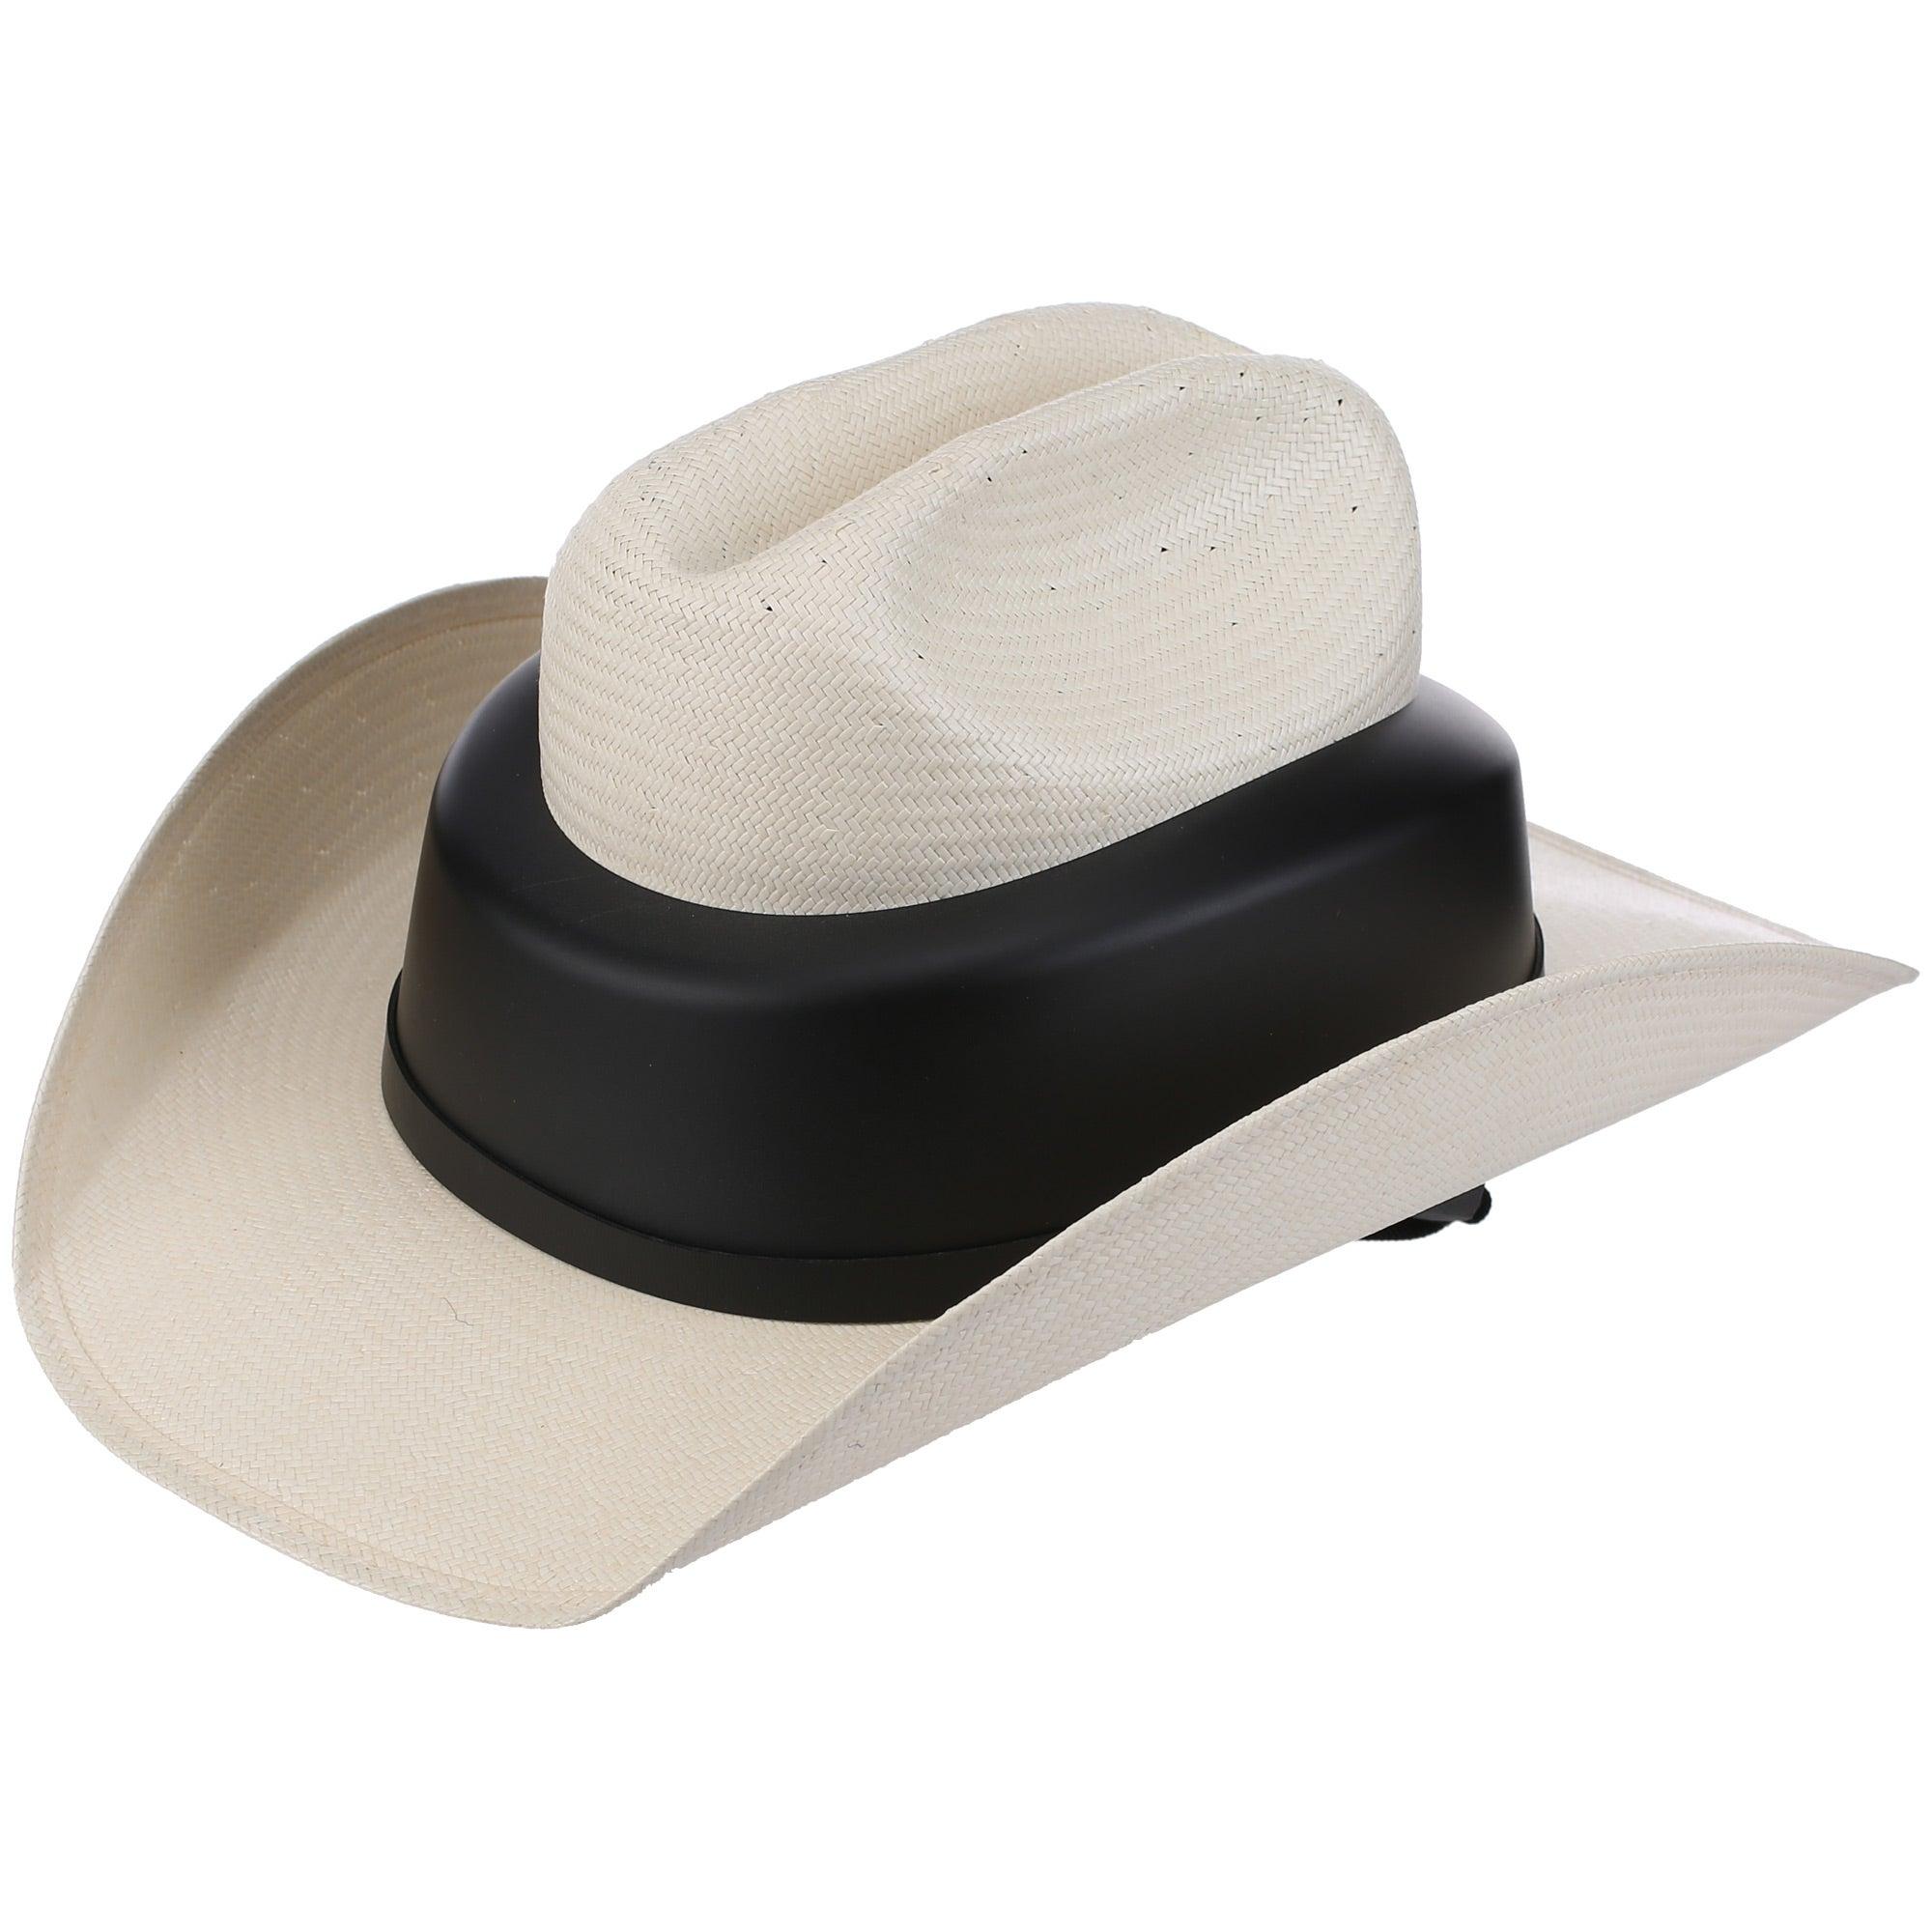 bc5a2925016 Resistol RideSafe Western Straw Cowboy Hat Helmet - Riding Warehouse